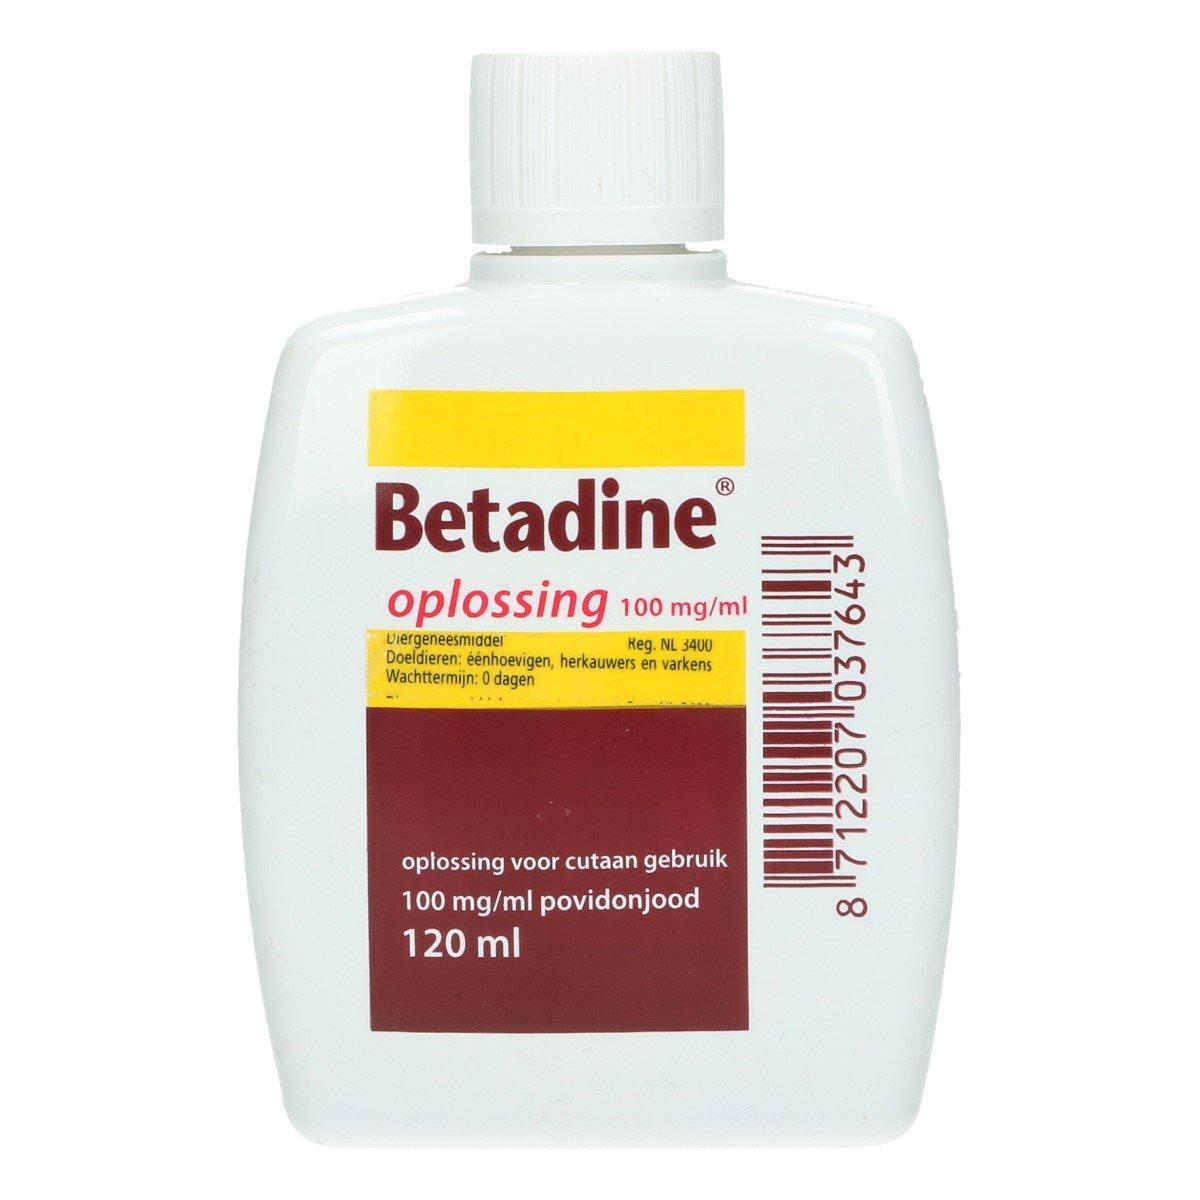 Afbeelding van Betadine Oplossing 120ml